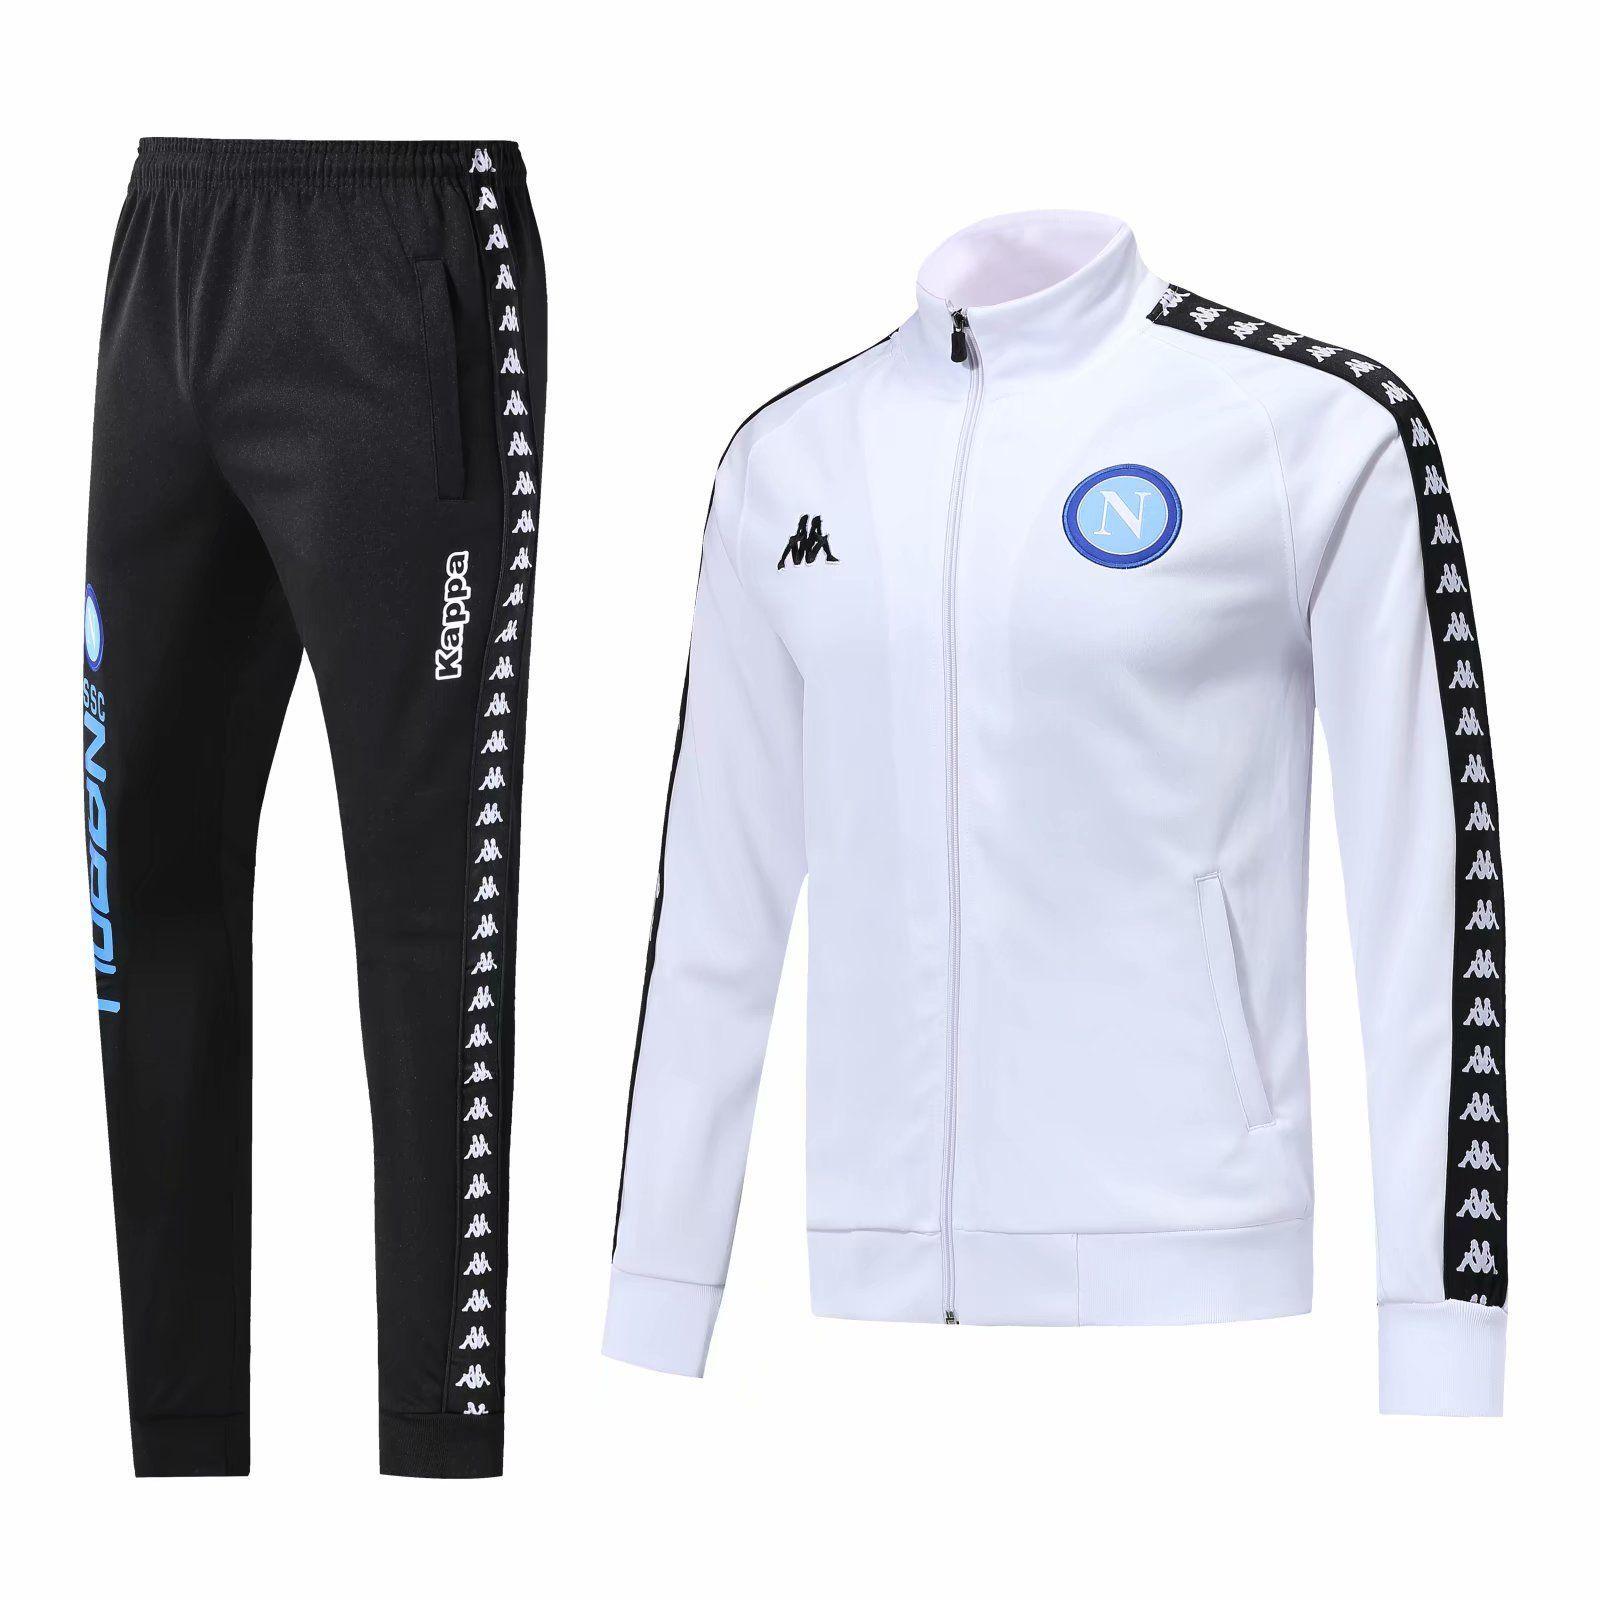 new styles 0e5fb ba2be SSC Napoli trackSuit Hamsik Insigne Callejon Zielinski 18/19 SSC Naples  white and black jacket set 2018 2019 Soccer veste suit